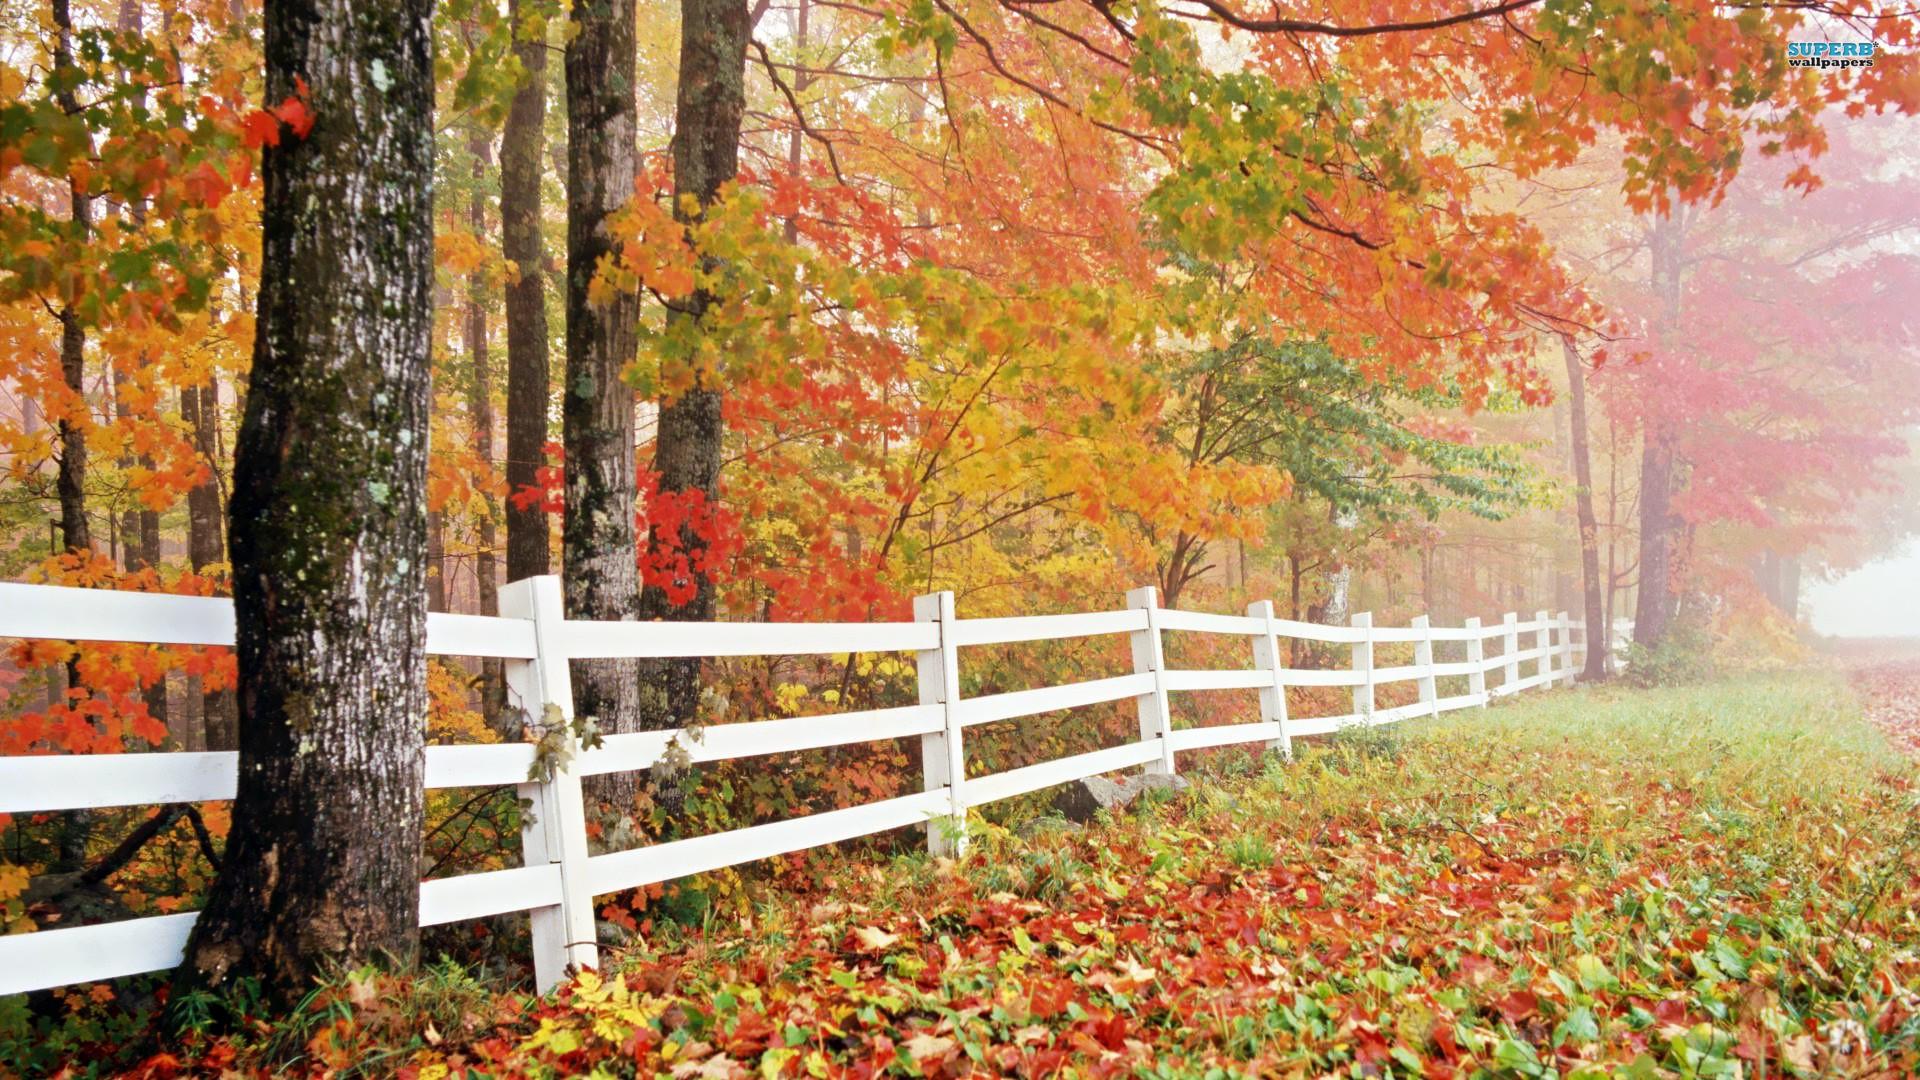 Nature Wallpaper Autumn Free 1 Desktop Wallpapers Hd Fall Backgrounds Windows 10 1920x1080 Wallpaper Teahub Io